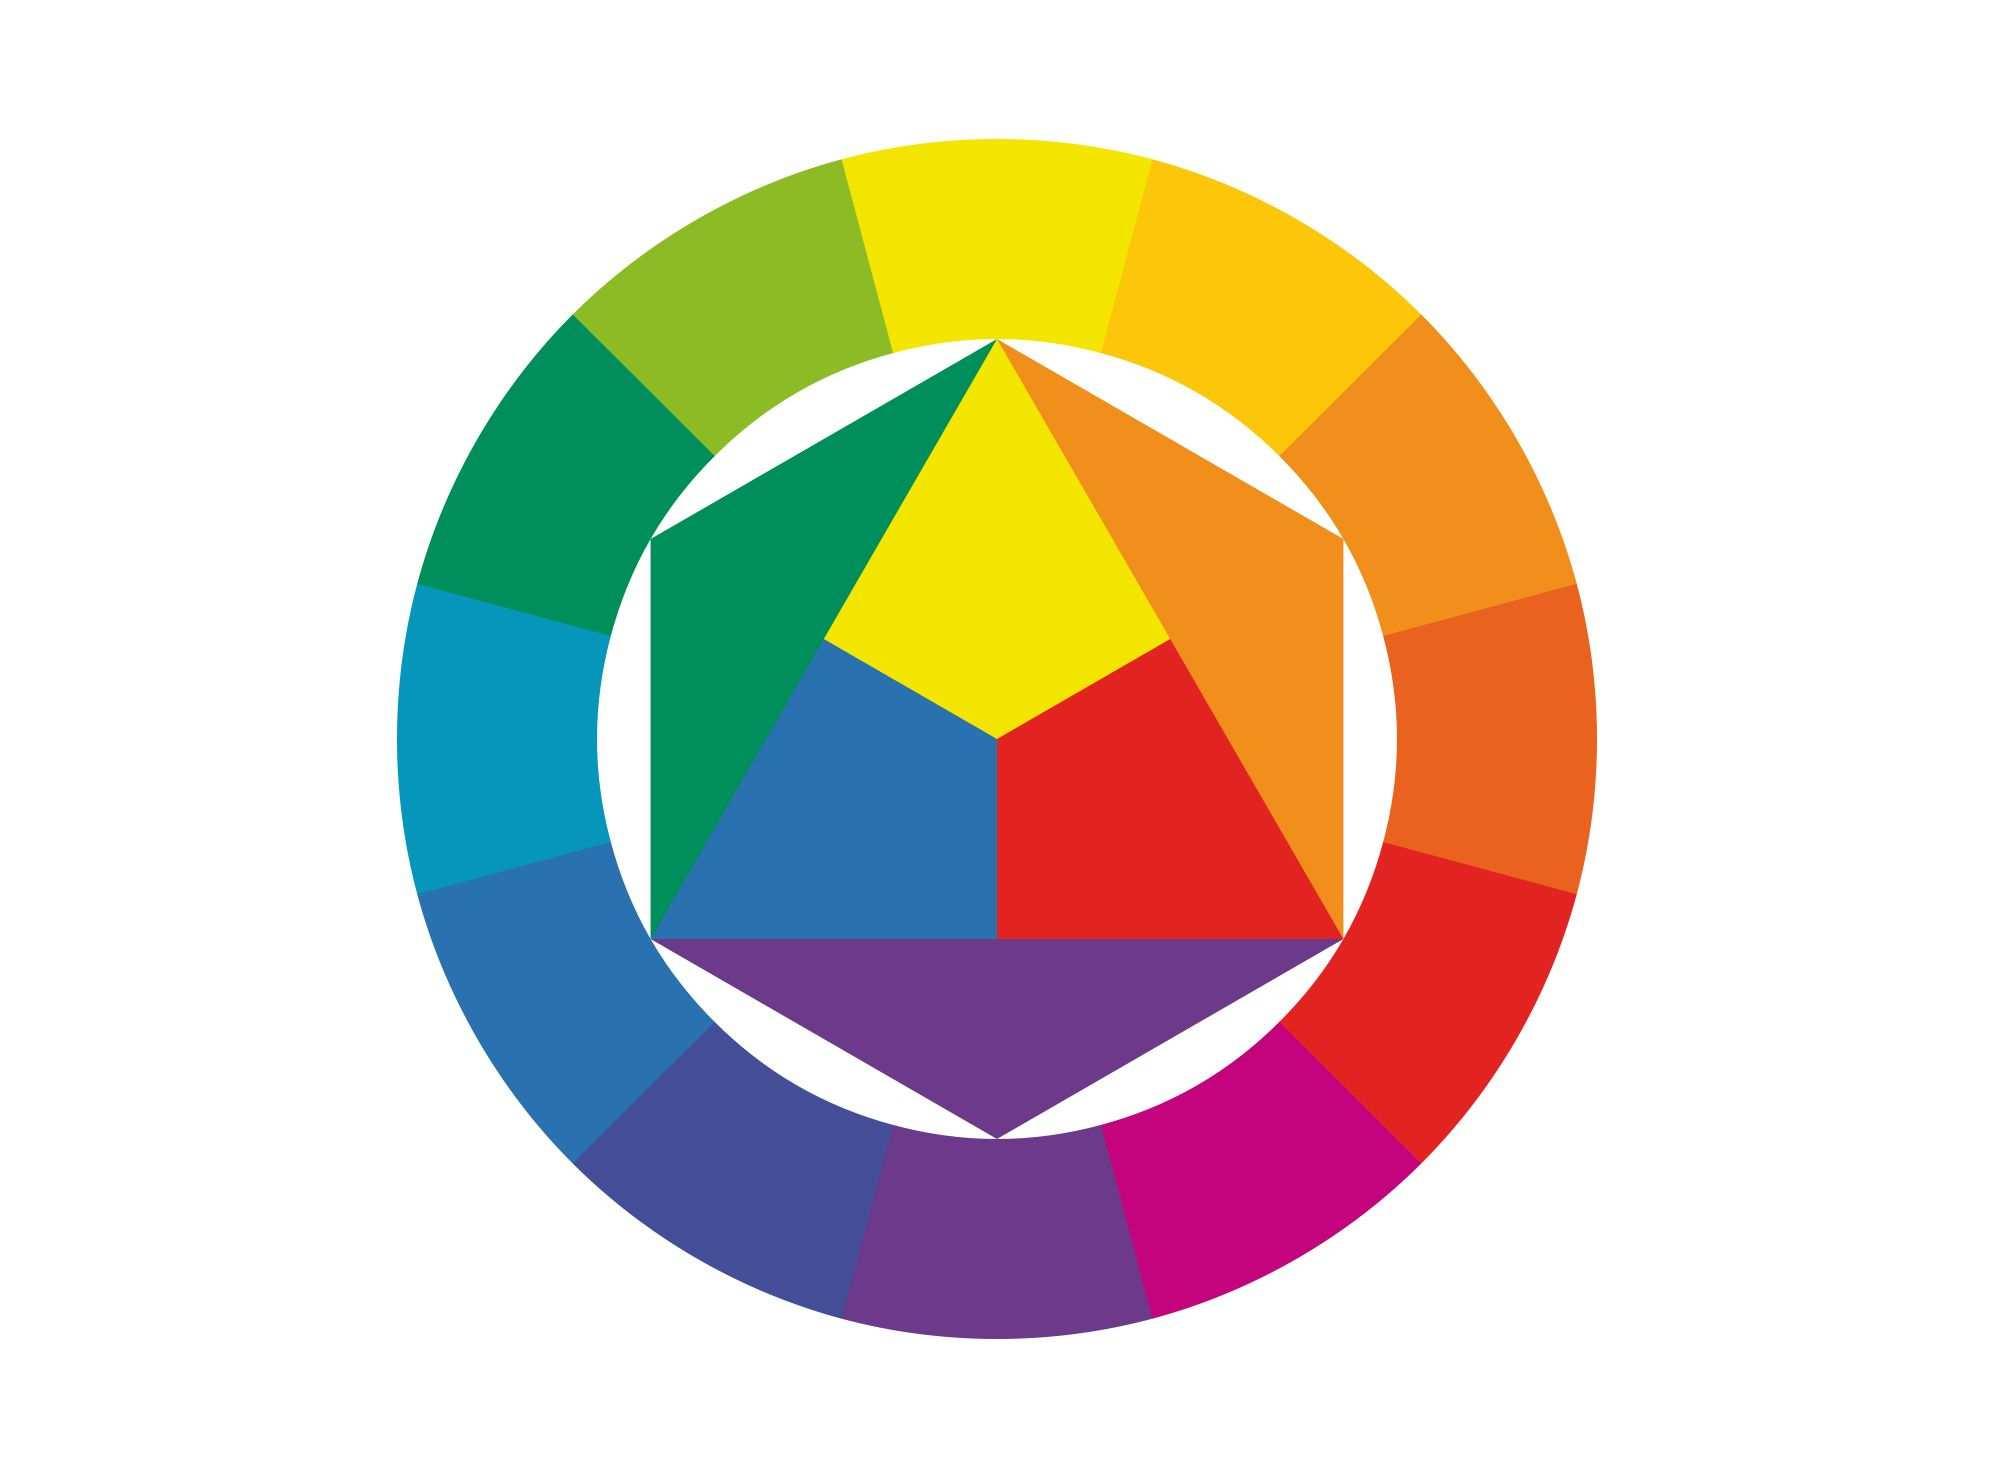 Farbkreis Farbkreis Farben Lehre Farbenlehre